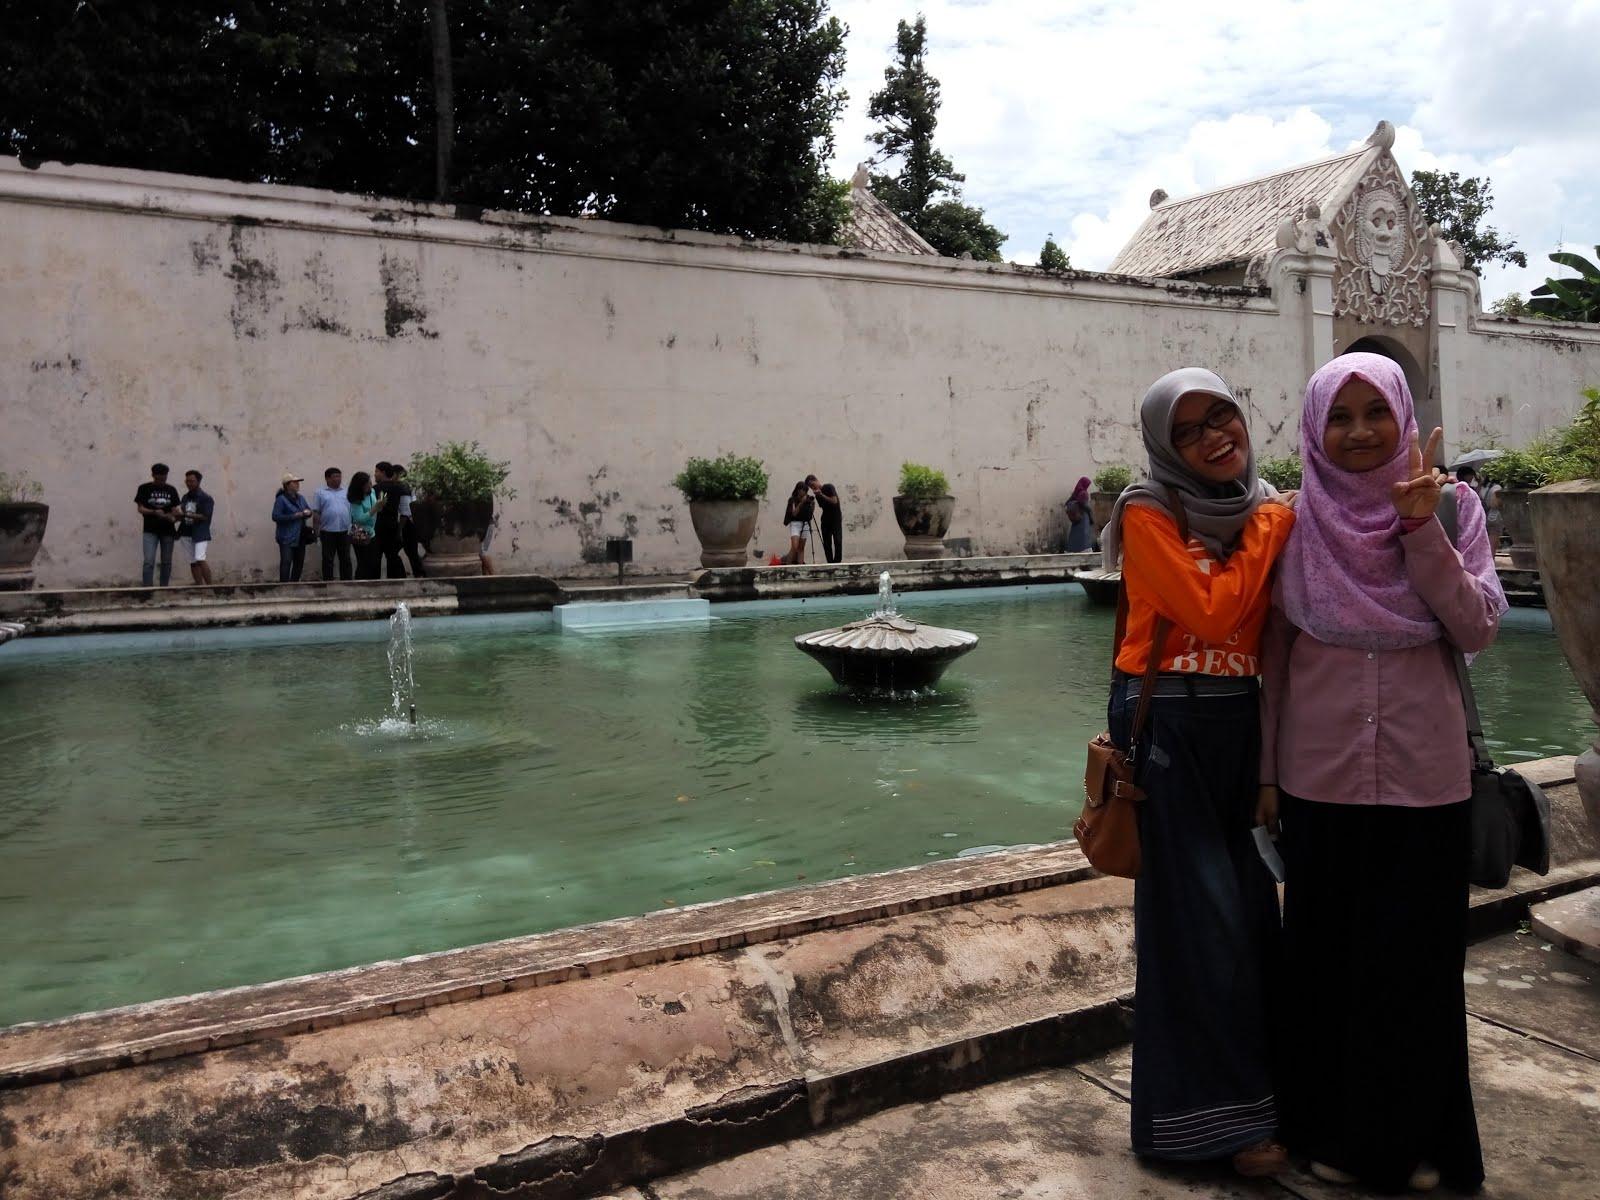 Taman Sari Yogyakarta 12/16